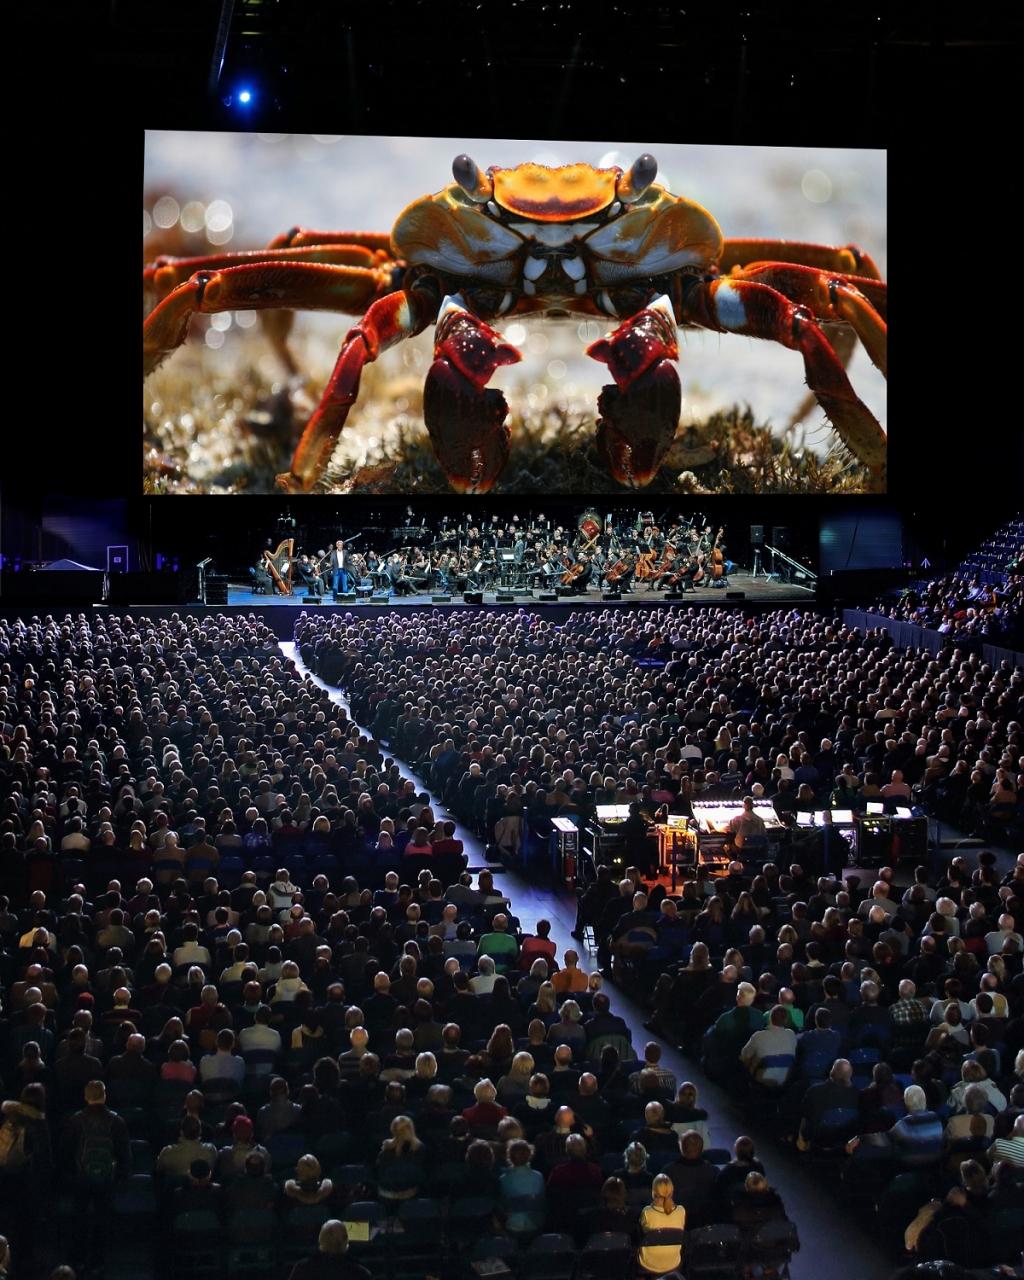 stockholm music events